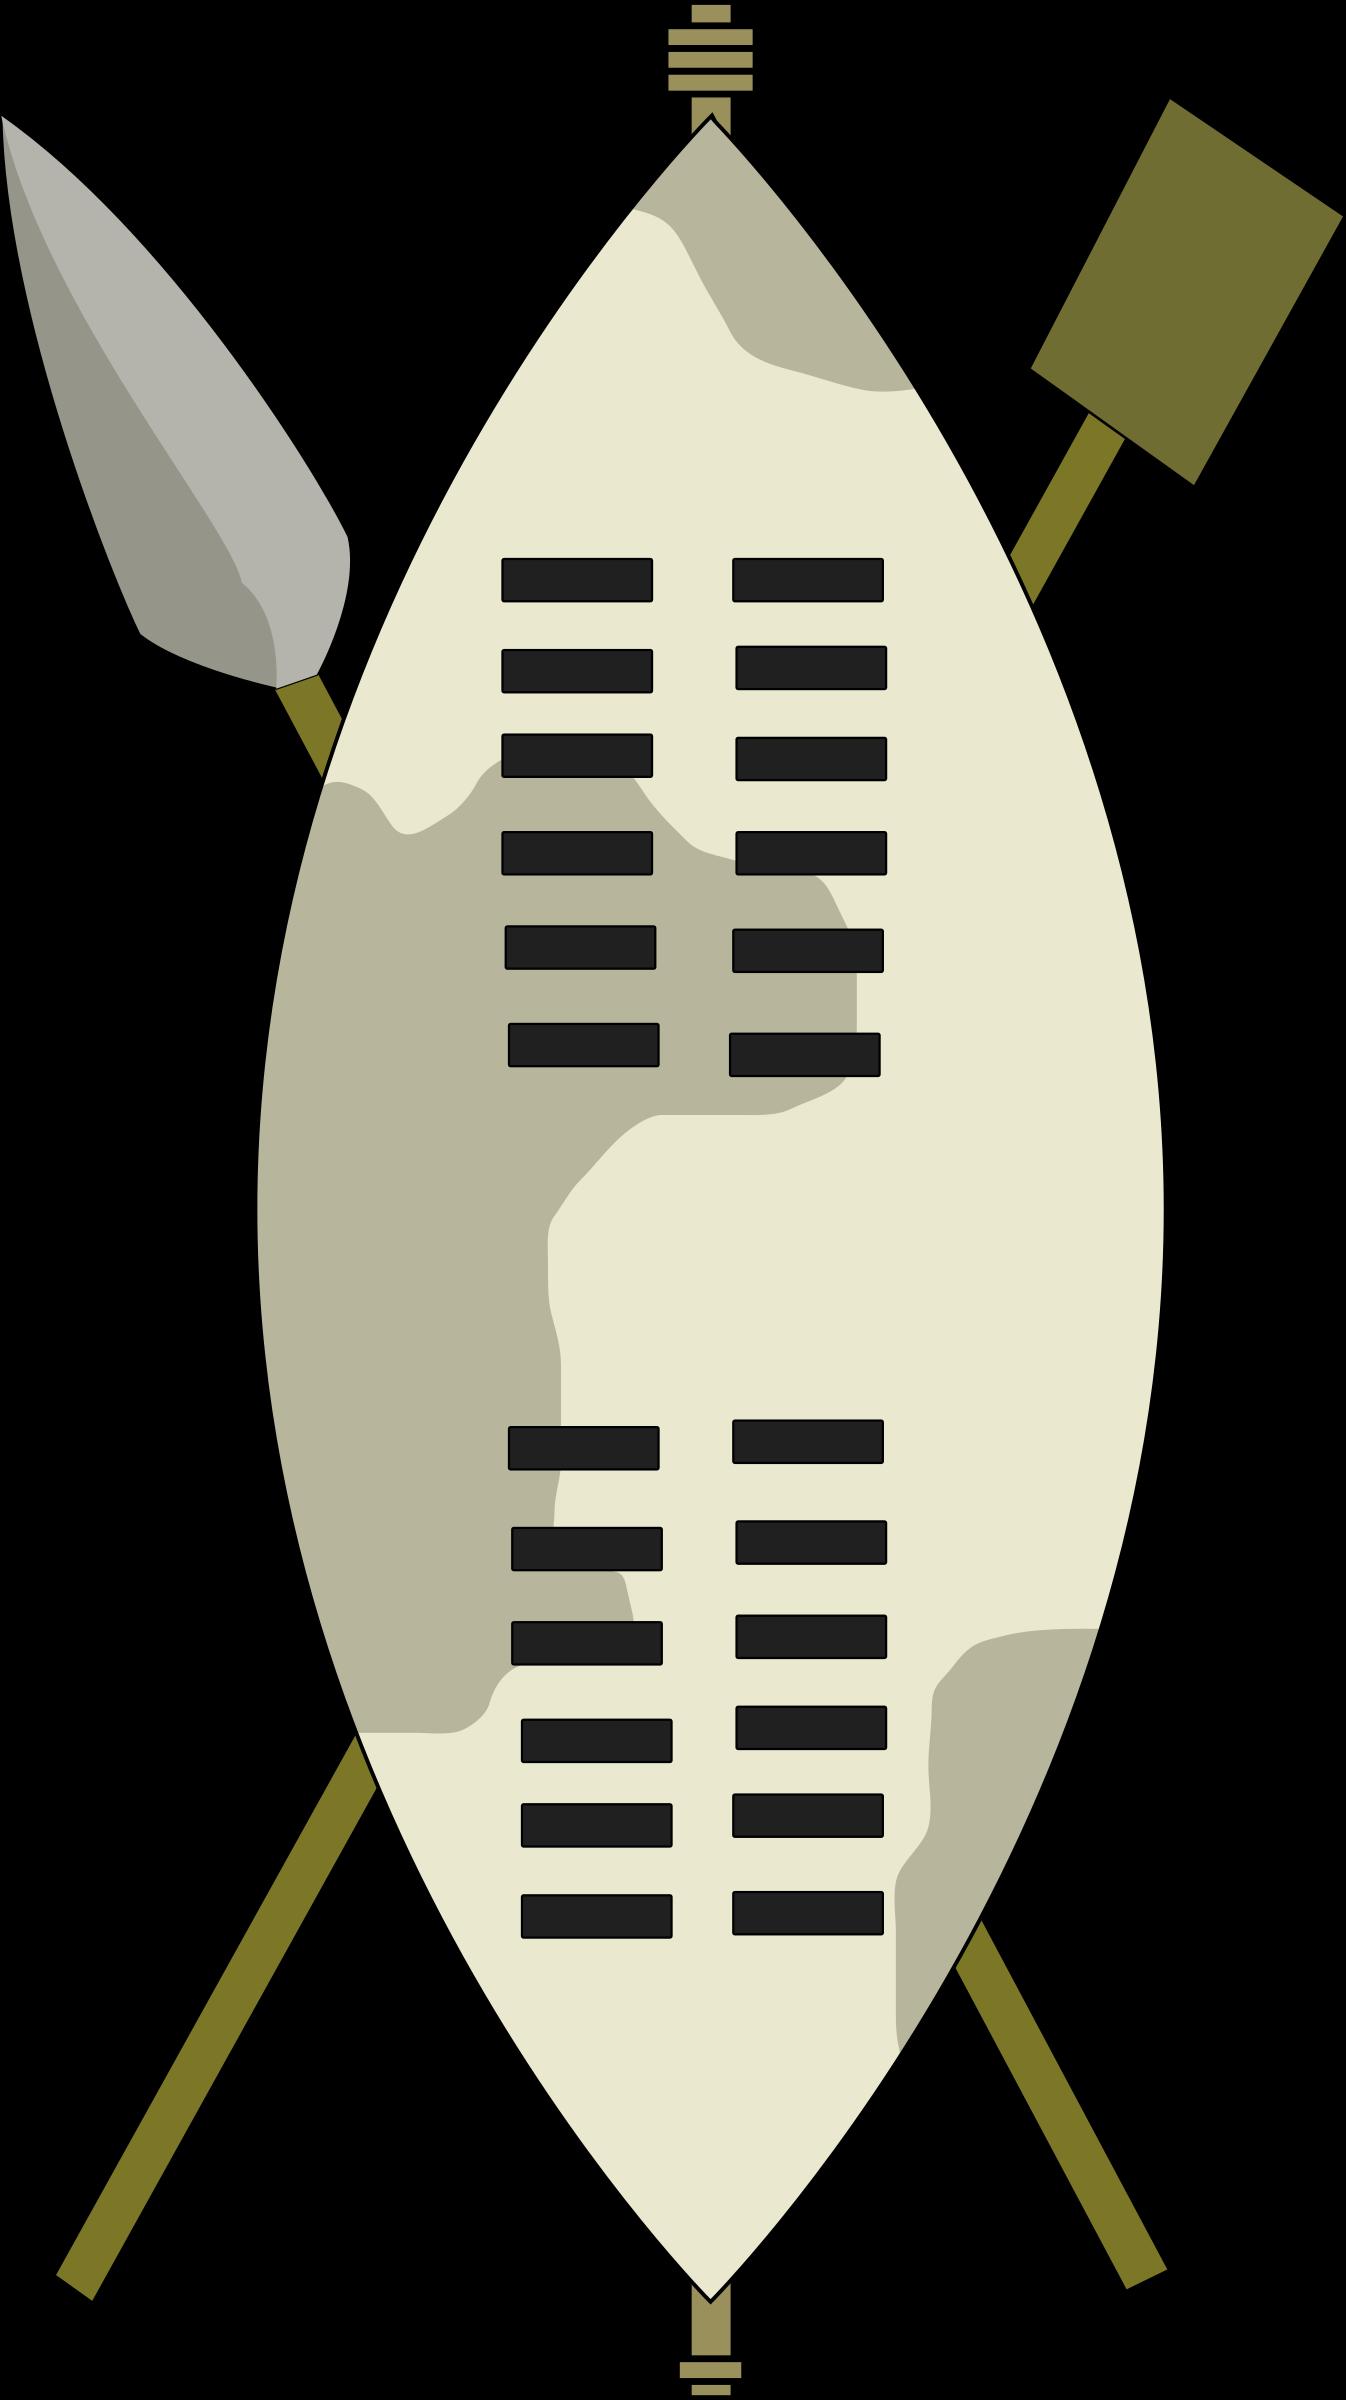 Zulu shield clipart.